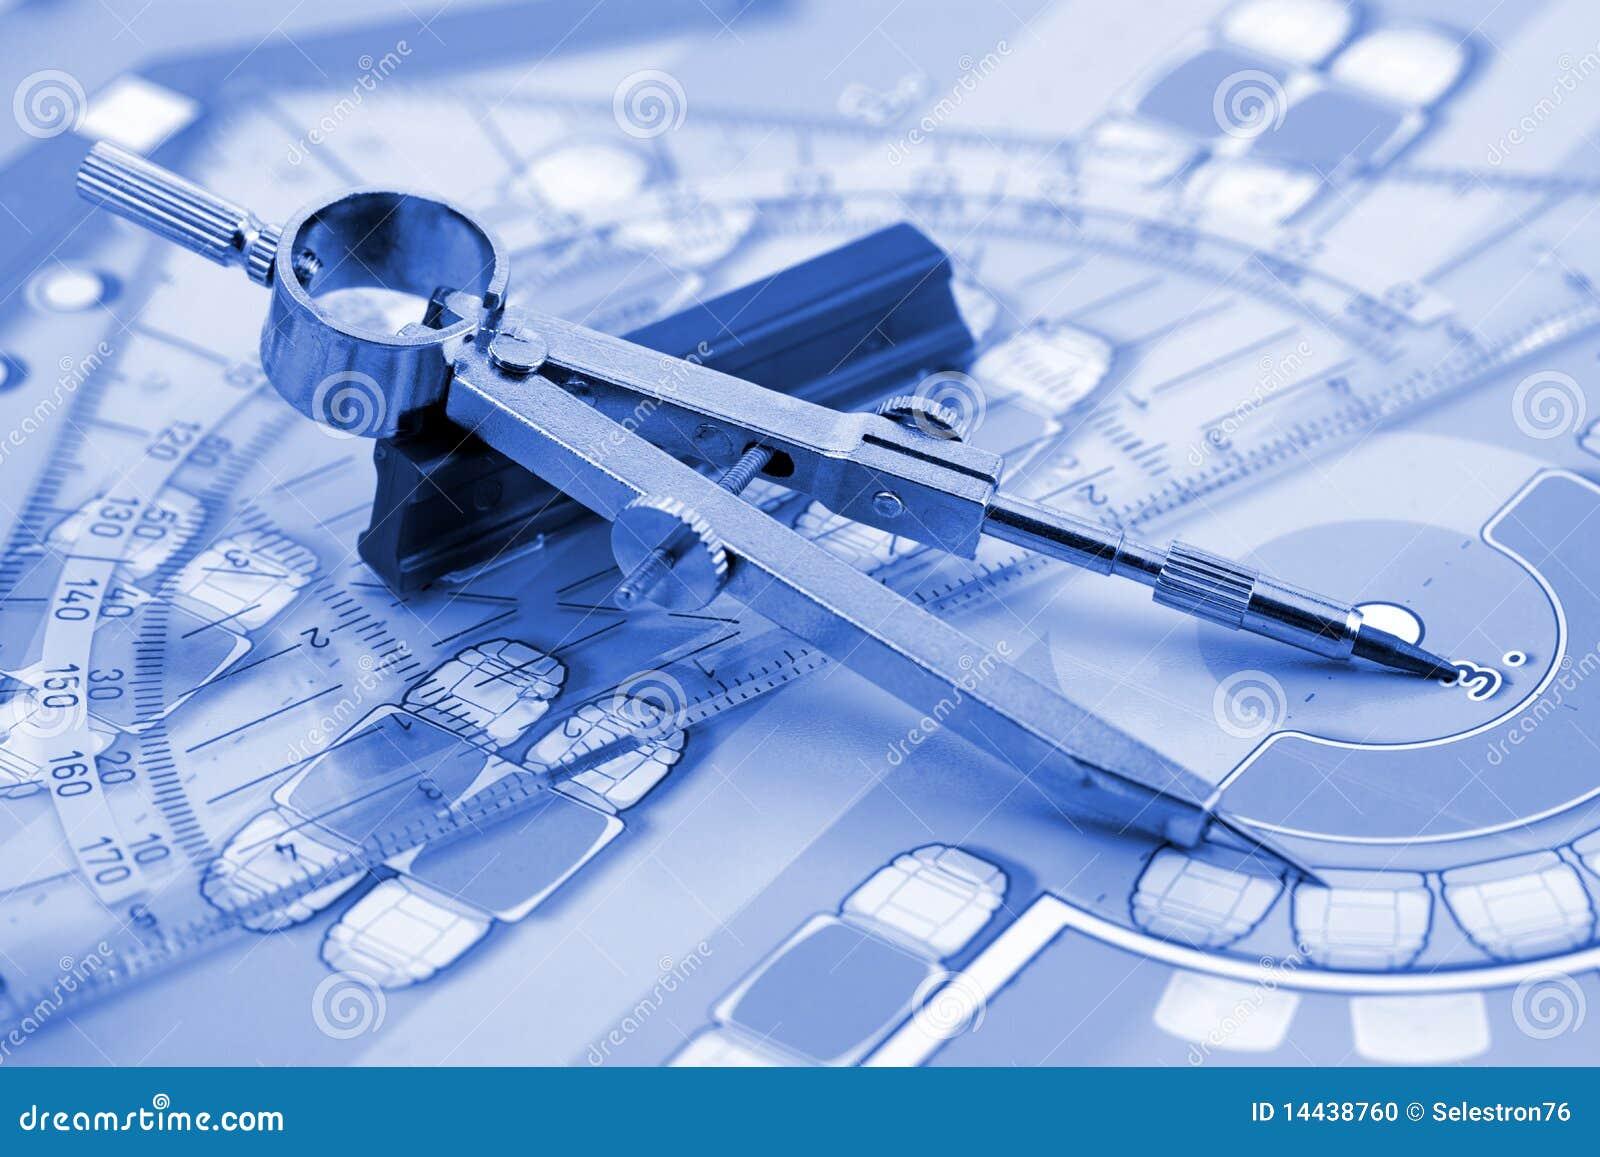 Architecture Plan Work Tools Stock Photo Image 14438760